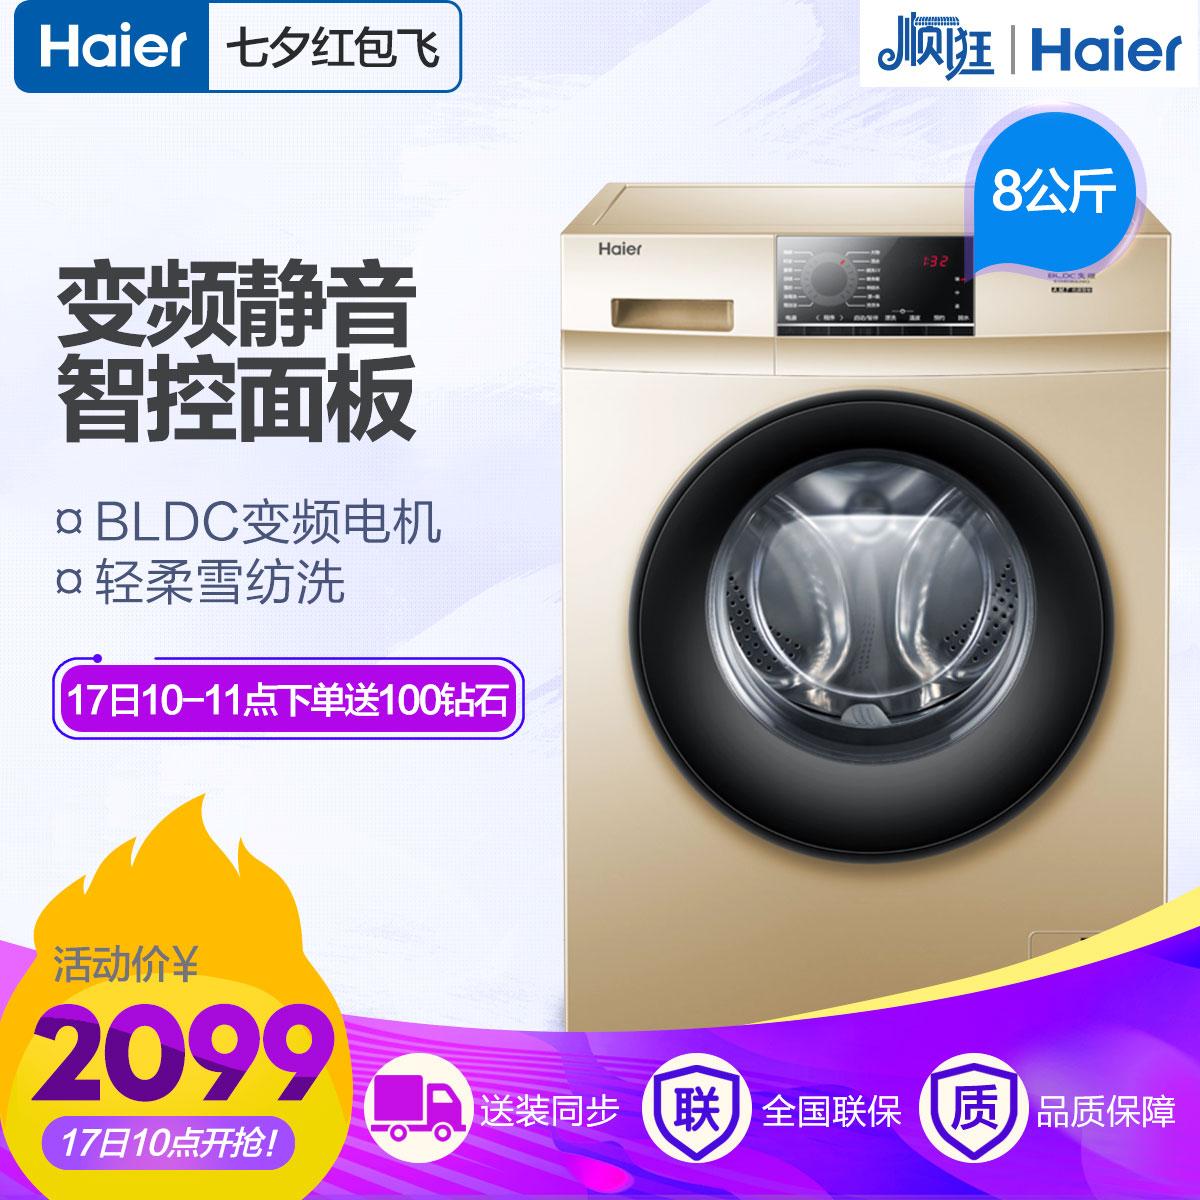 ca88亚洲城真人娱乐静音智控面板 消毒洗 EG80B829G 8公斤ca88亚洲城真人娱乐滚筒洗衣机